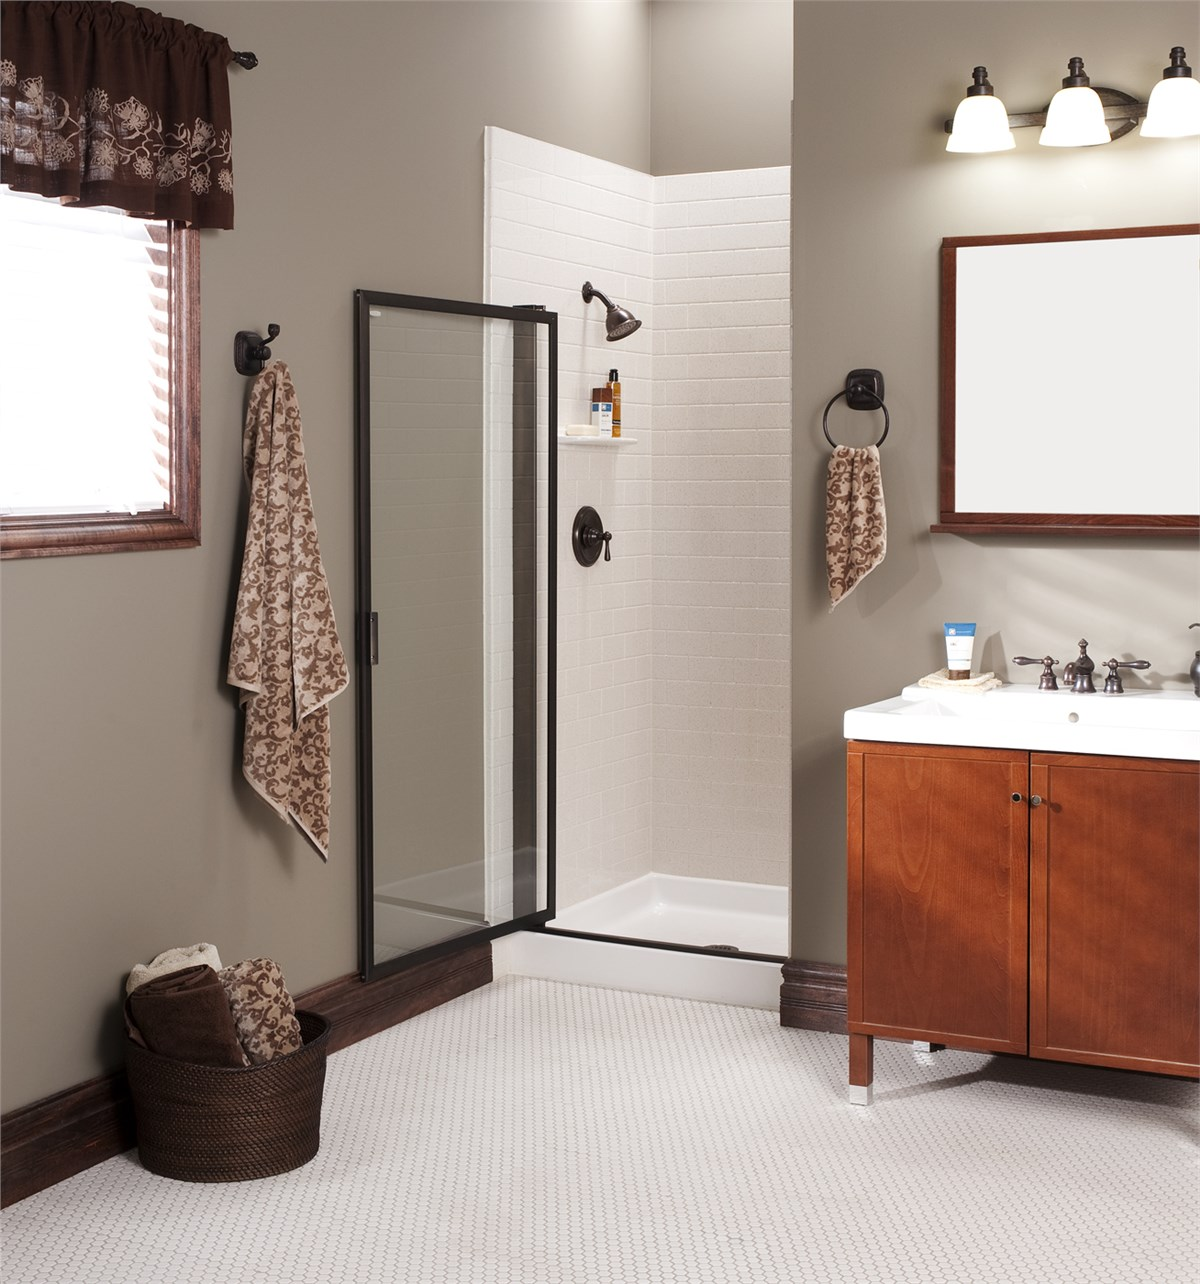 Bathroom Remodeling FAQs Green Bay Bathroom Remodeling Company - Bathroom remodel bend oregon